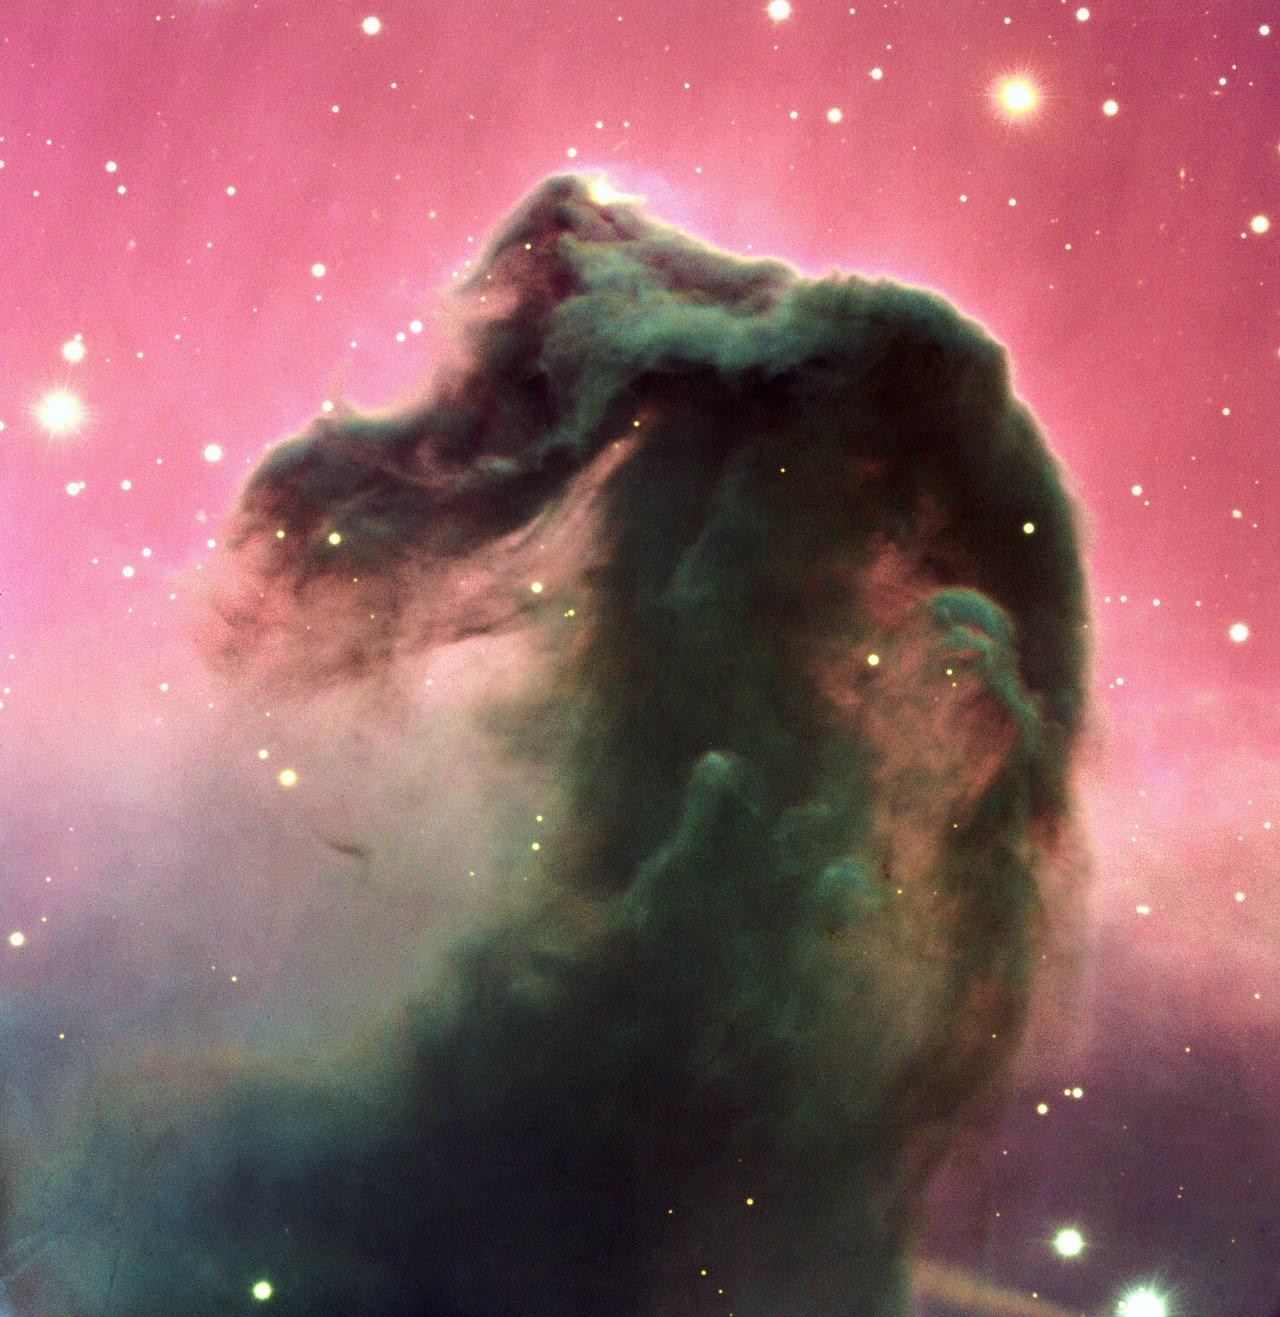 horsehead nebula - photo #5